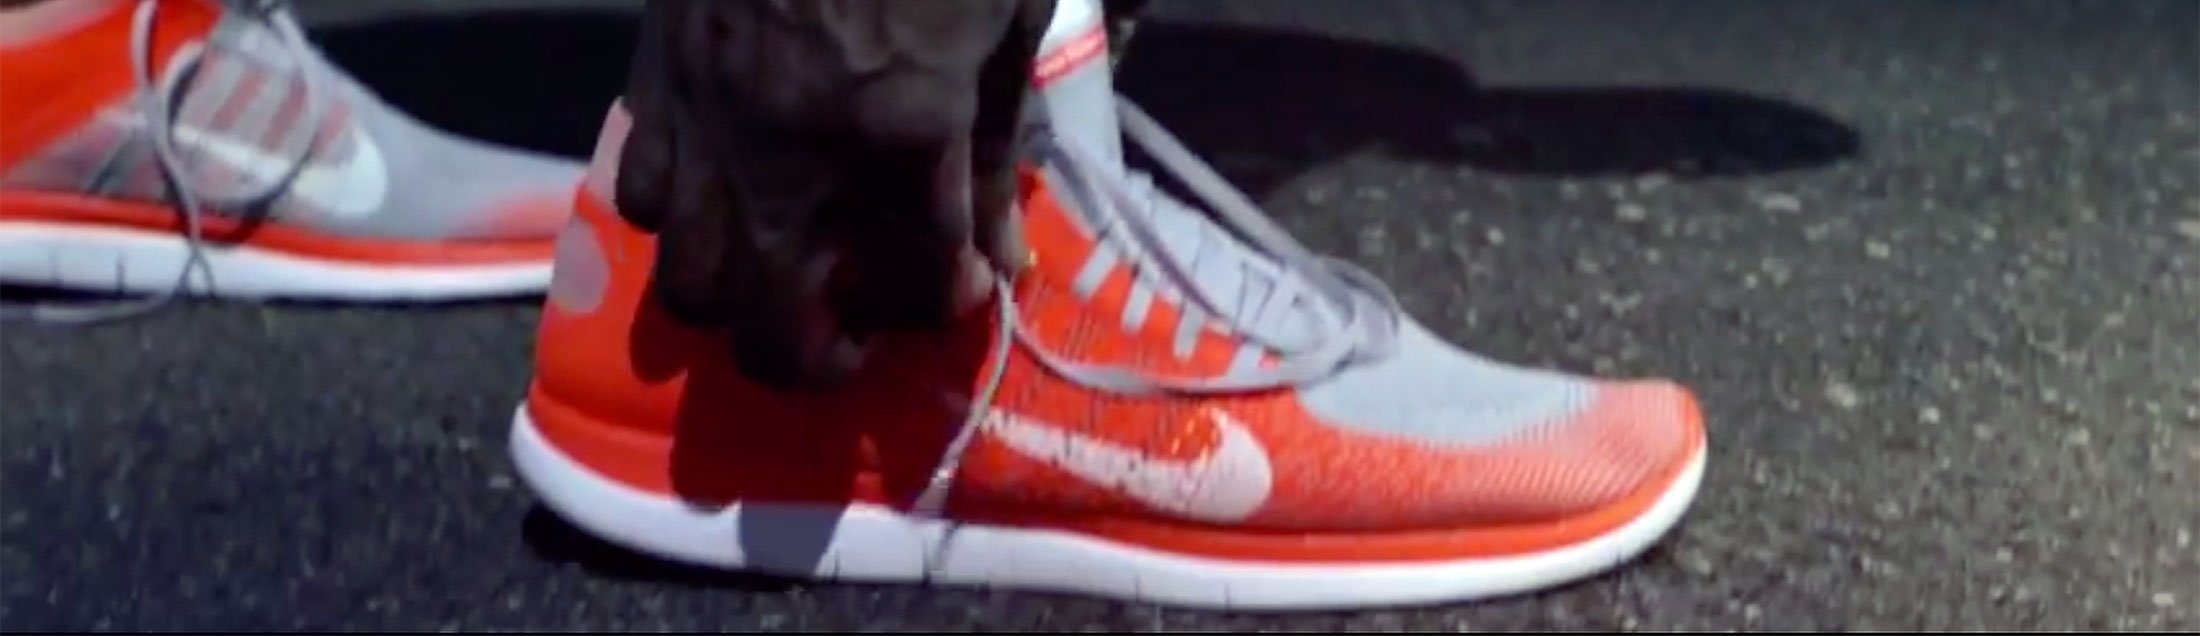 Nike Footwear Promo Duff Campbell